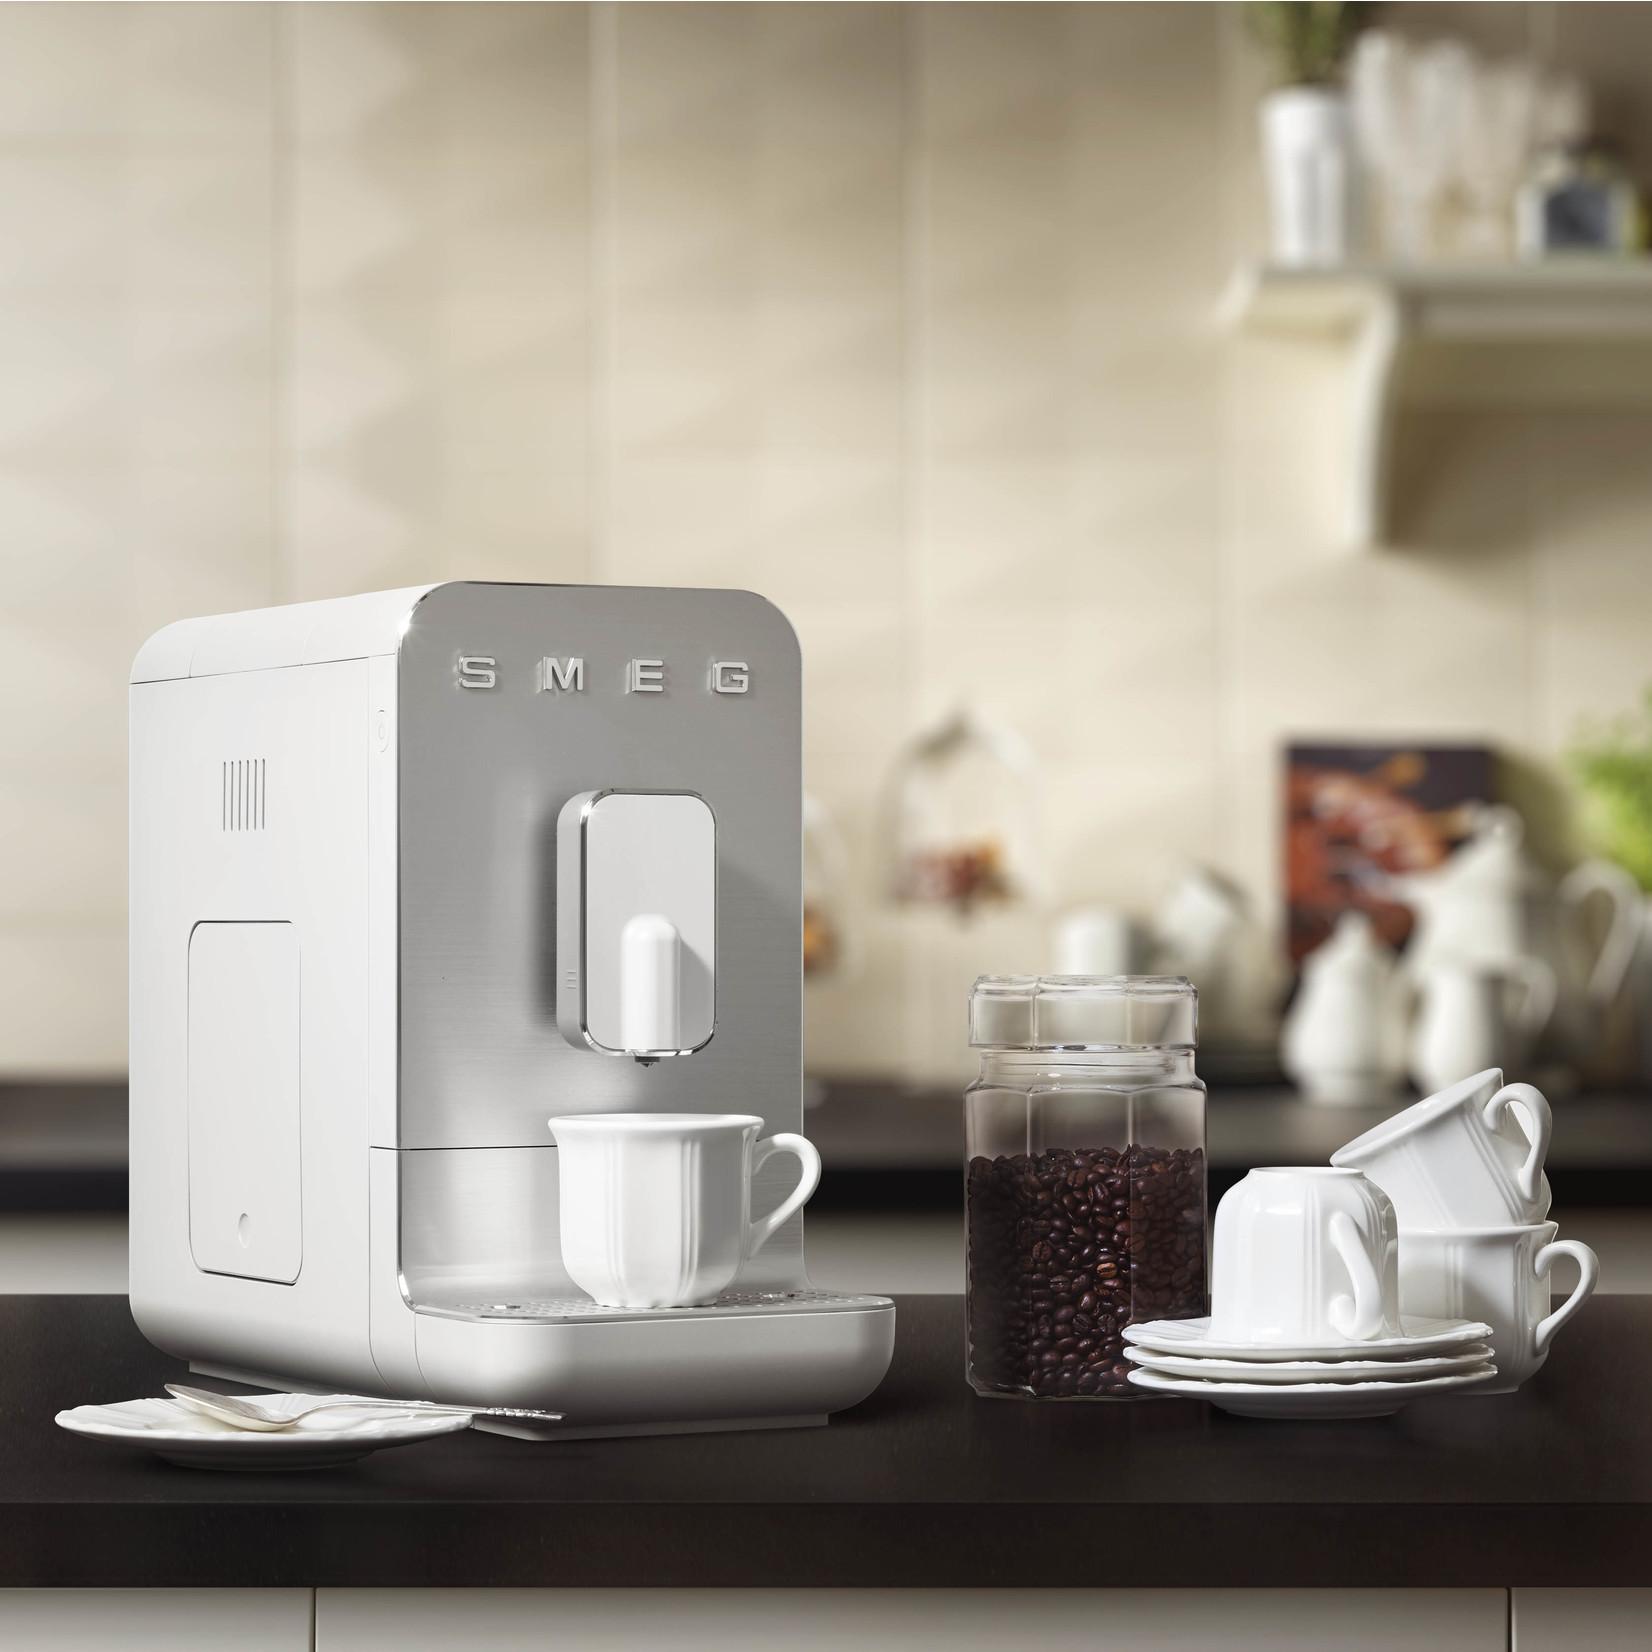 Smeg Smeg espressomachine basic, mat wit